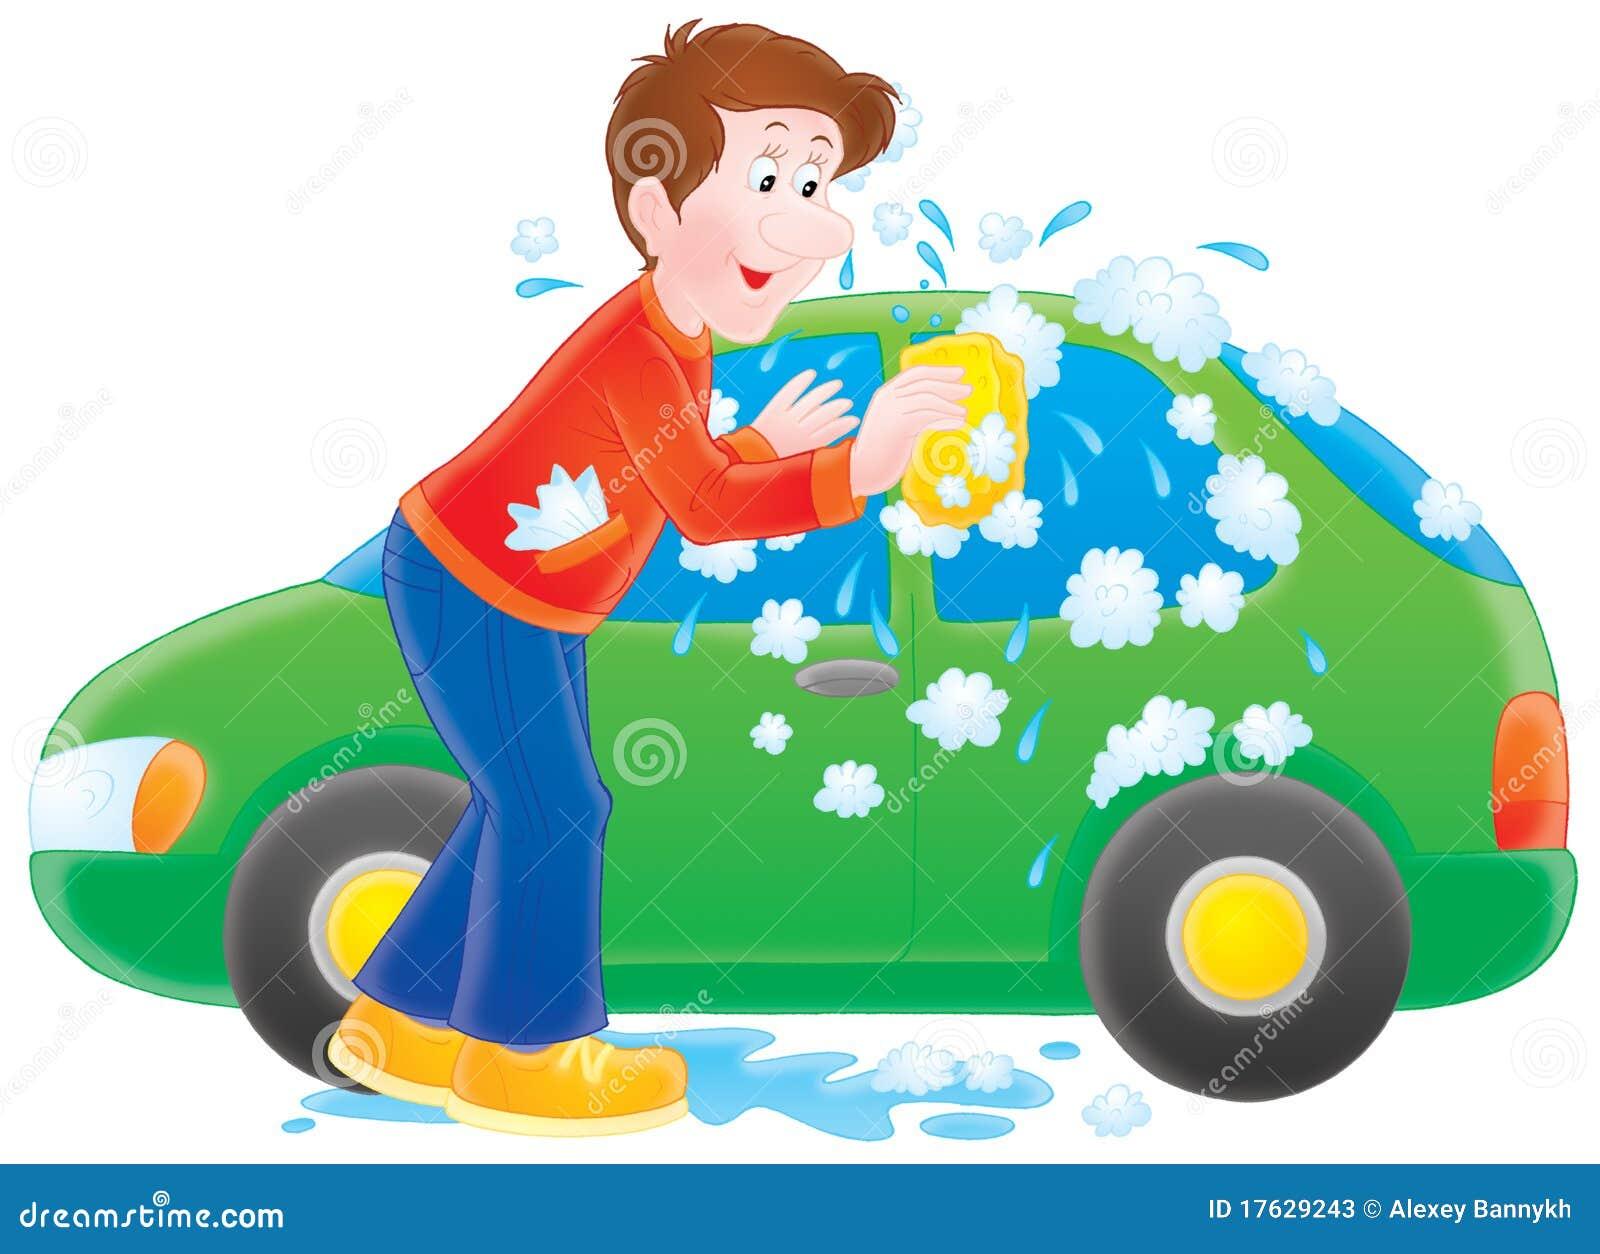 washing his car stock photos image 17629243